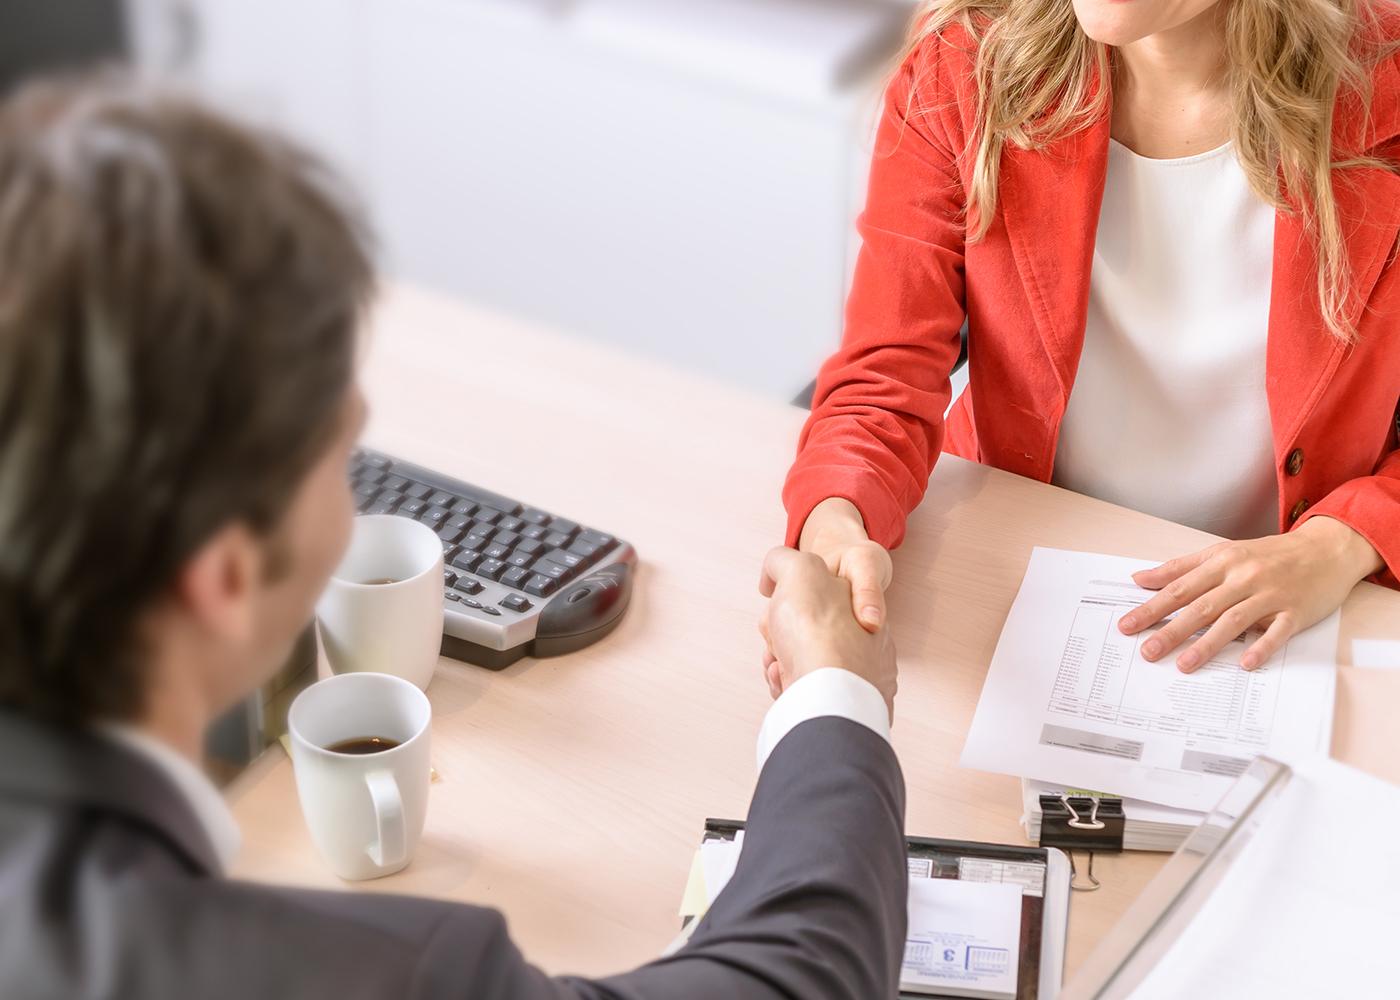 entrevista emprego para entrar  no mercado de trabalho